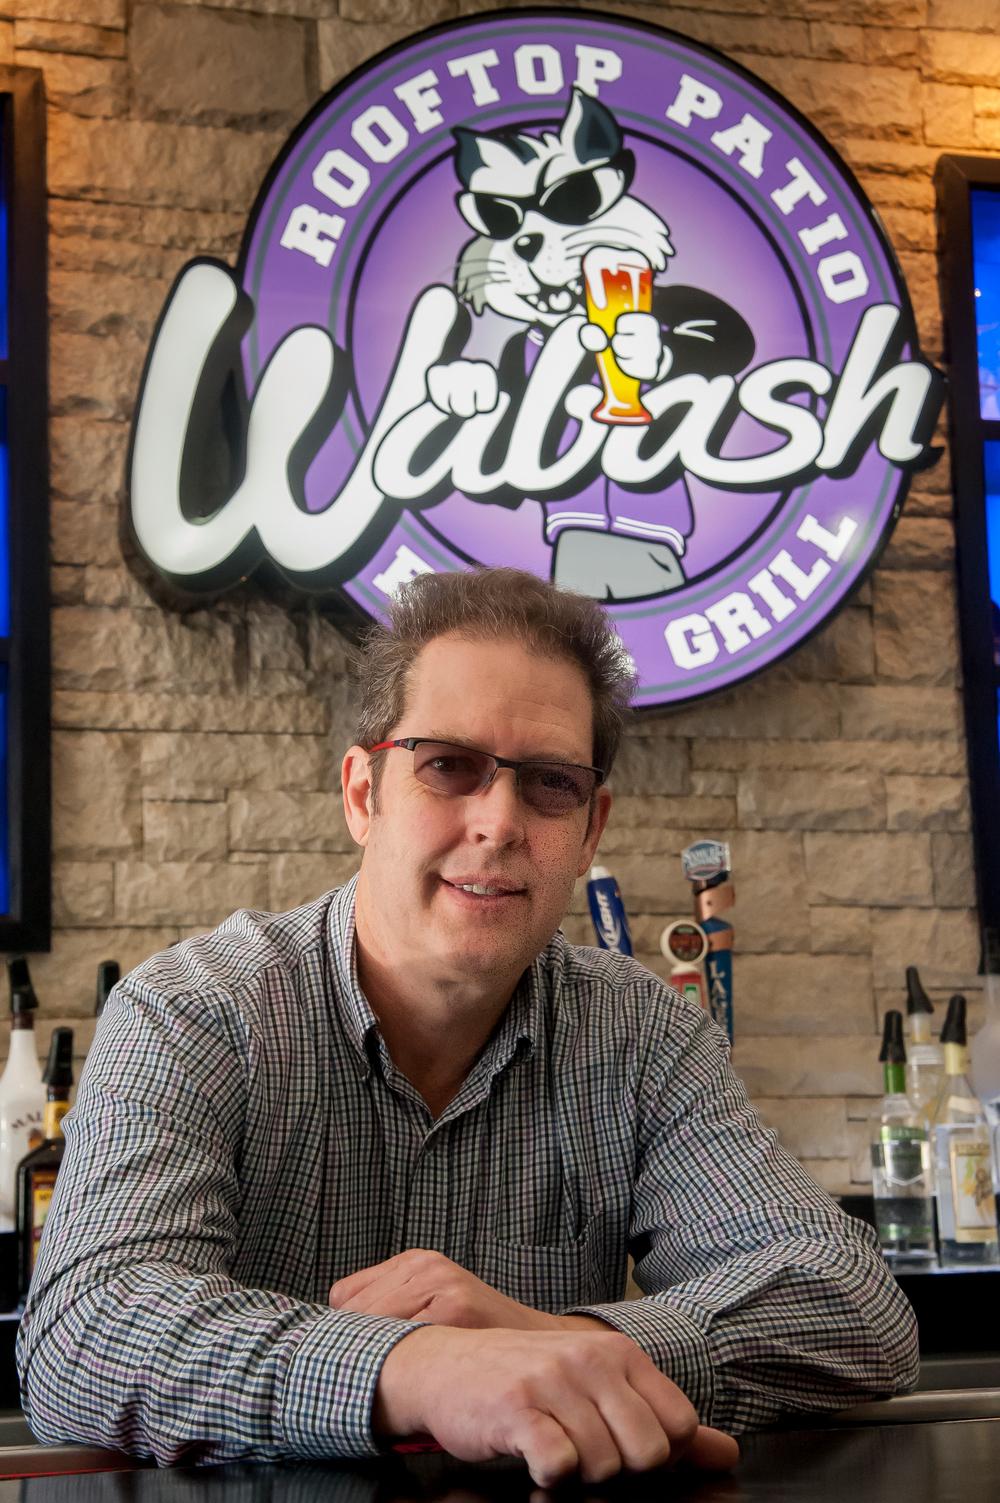 Wabash-3.jpg